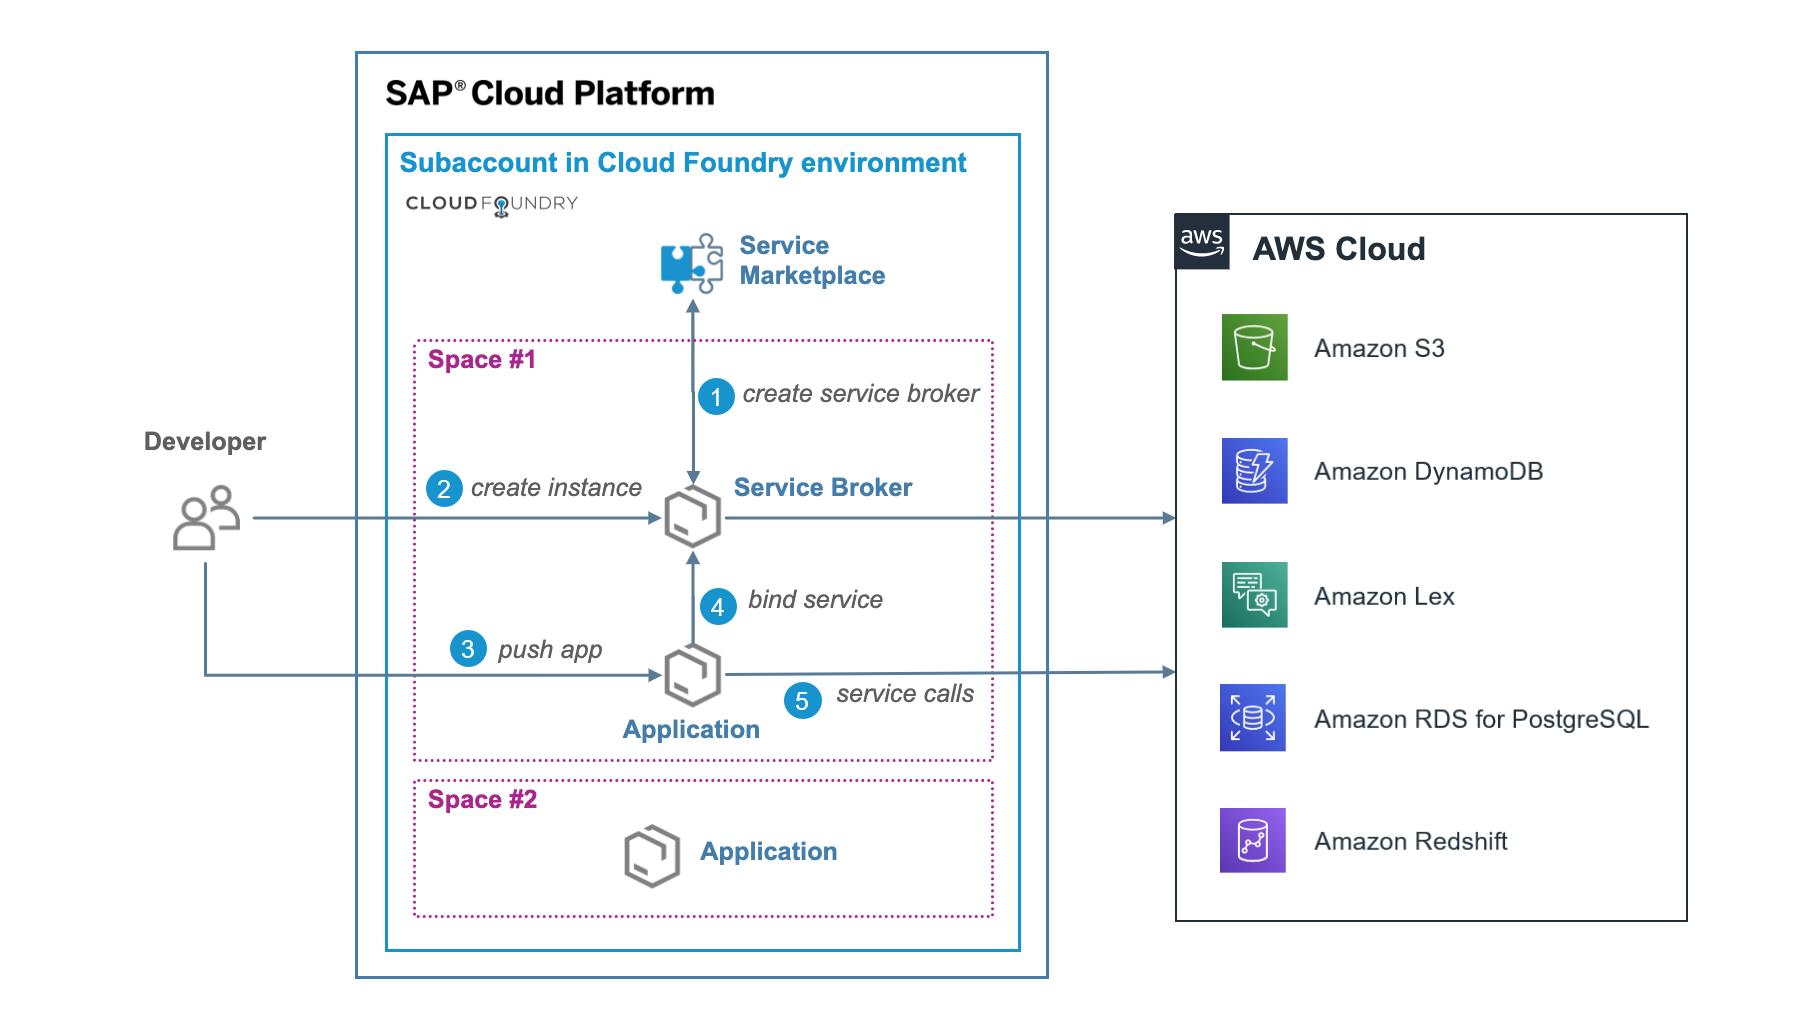 How to consume AWS services on SAP Cloud Platform? | SAP Blogs